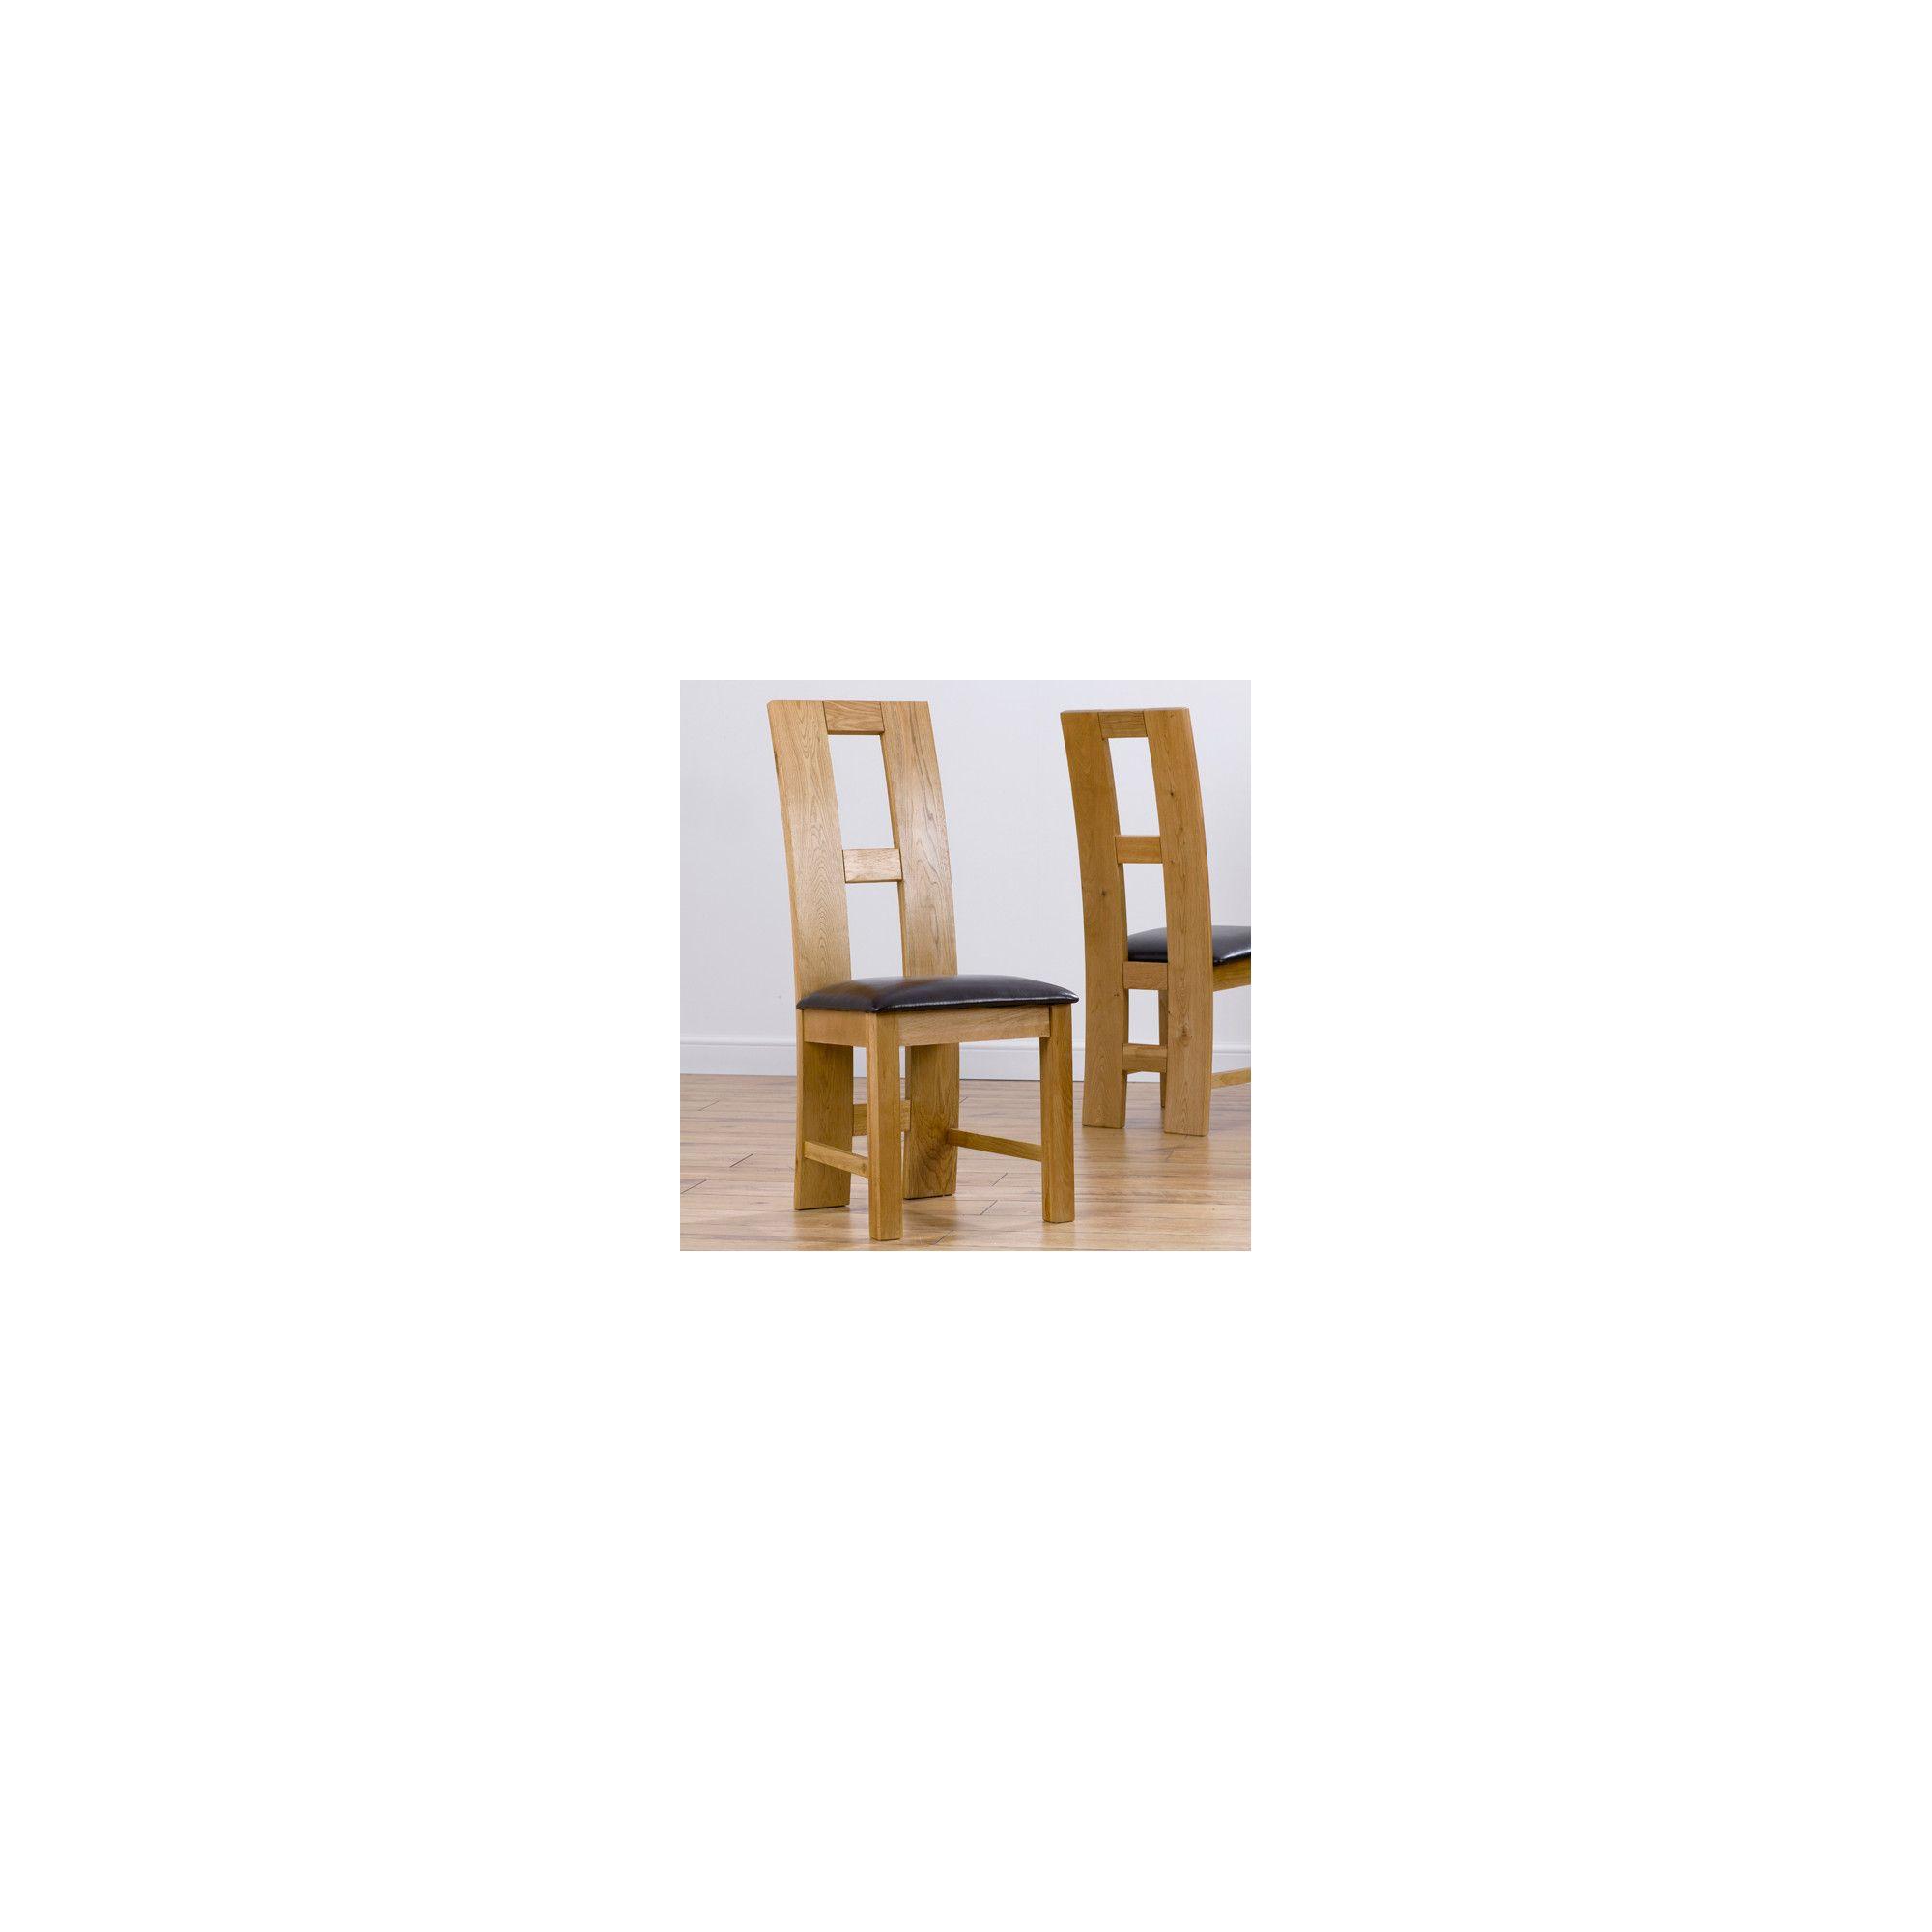 Mark Harris Furniture John Louis Dining Chair (Set of 2) - Bycast Black